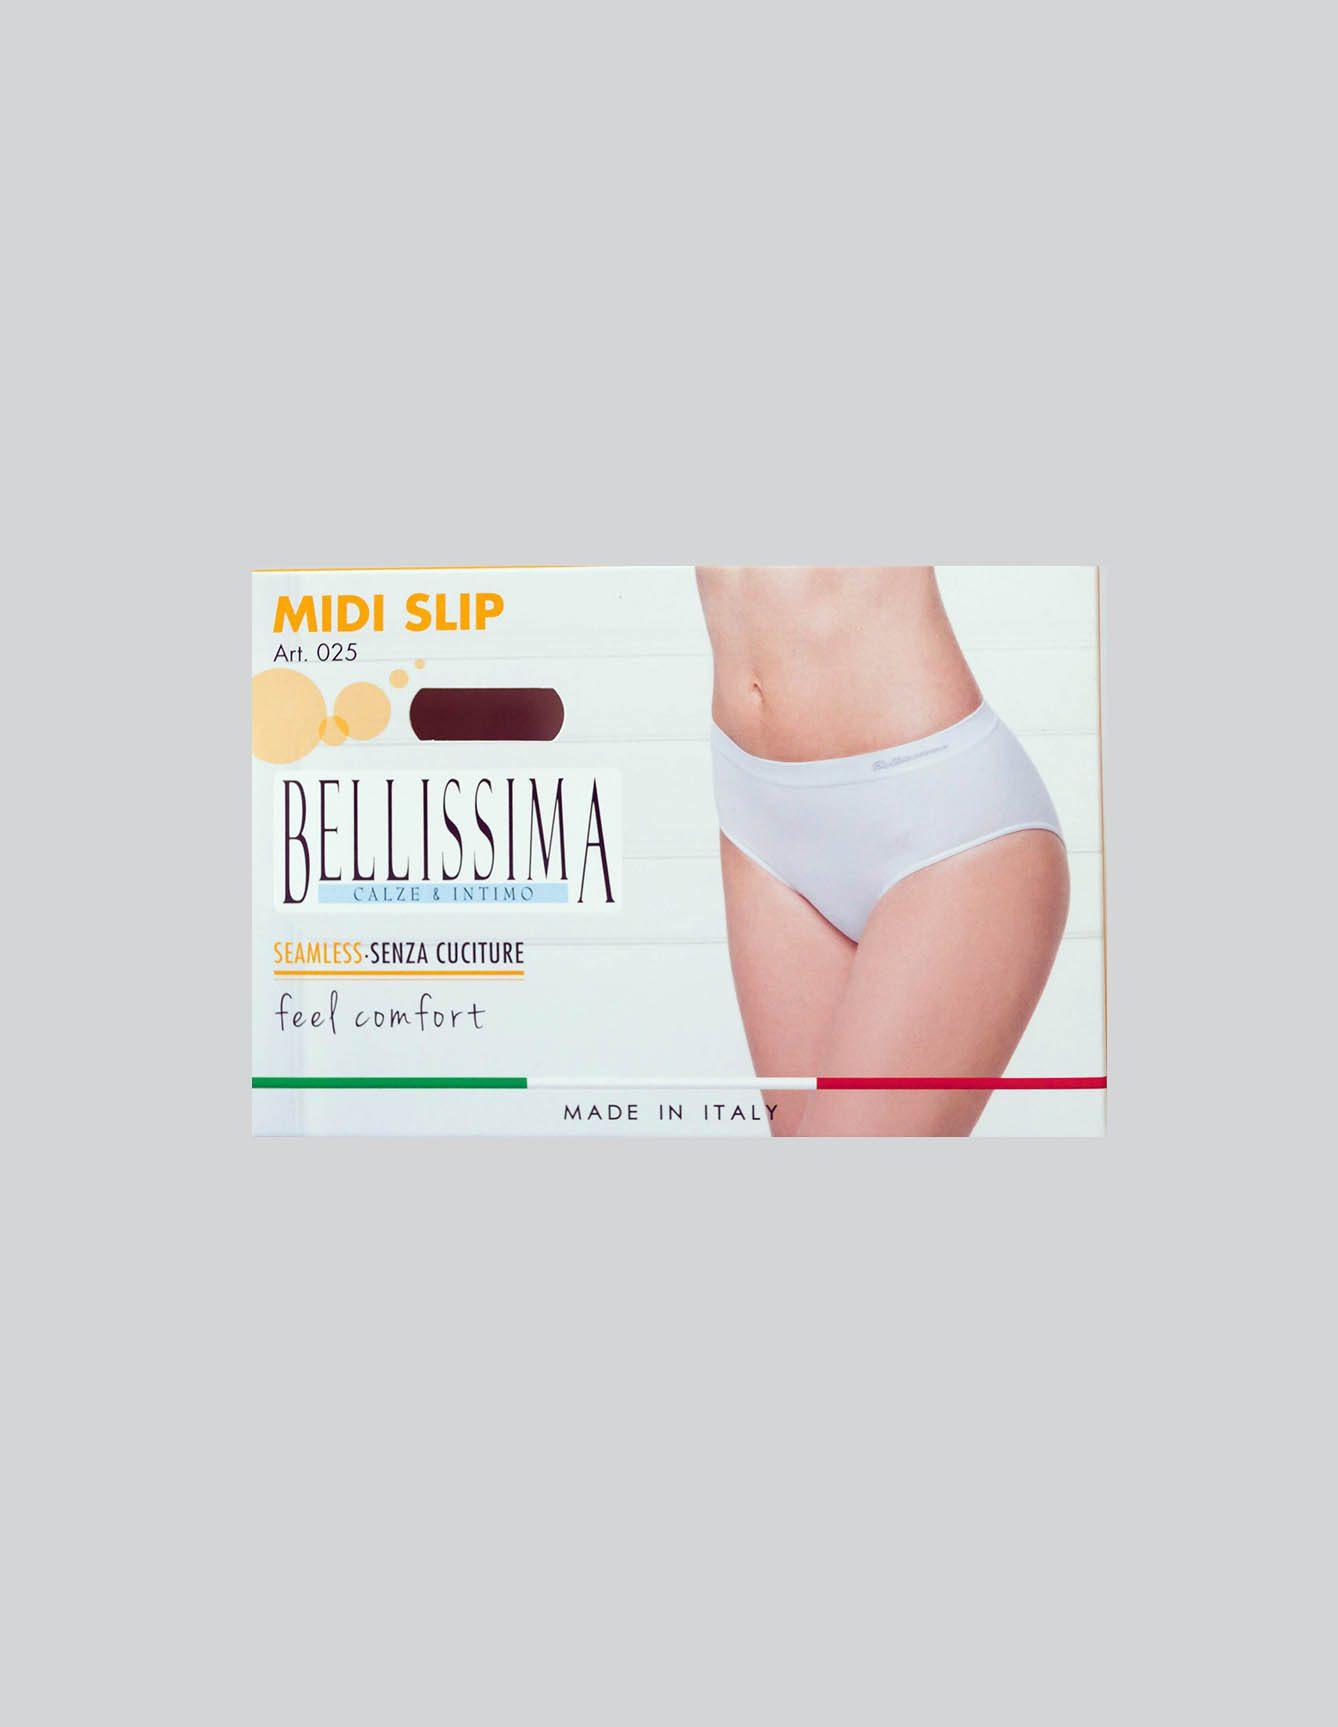 Chilot Bellissima Midi Slip